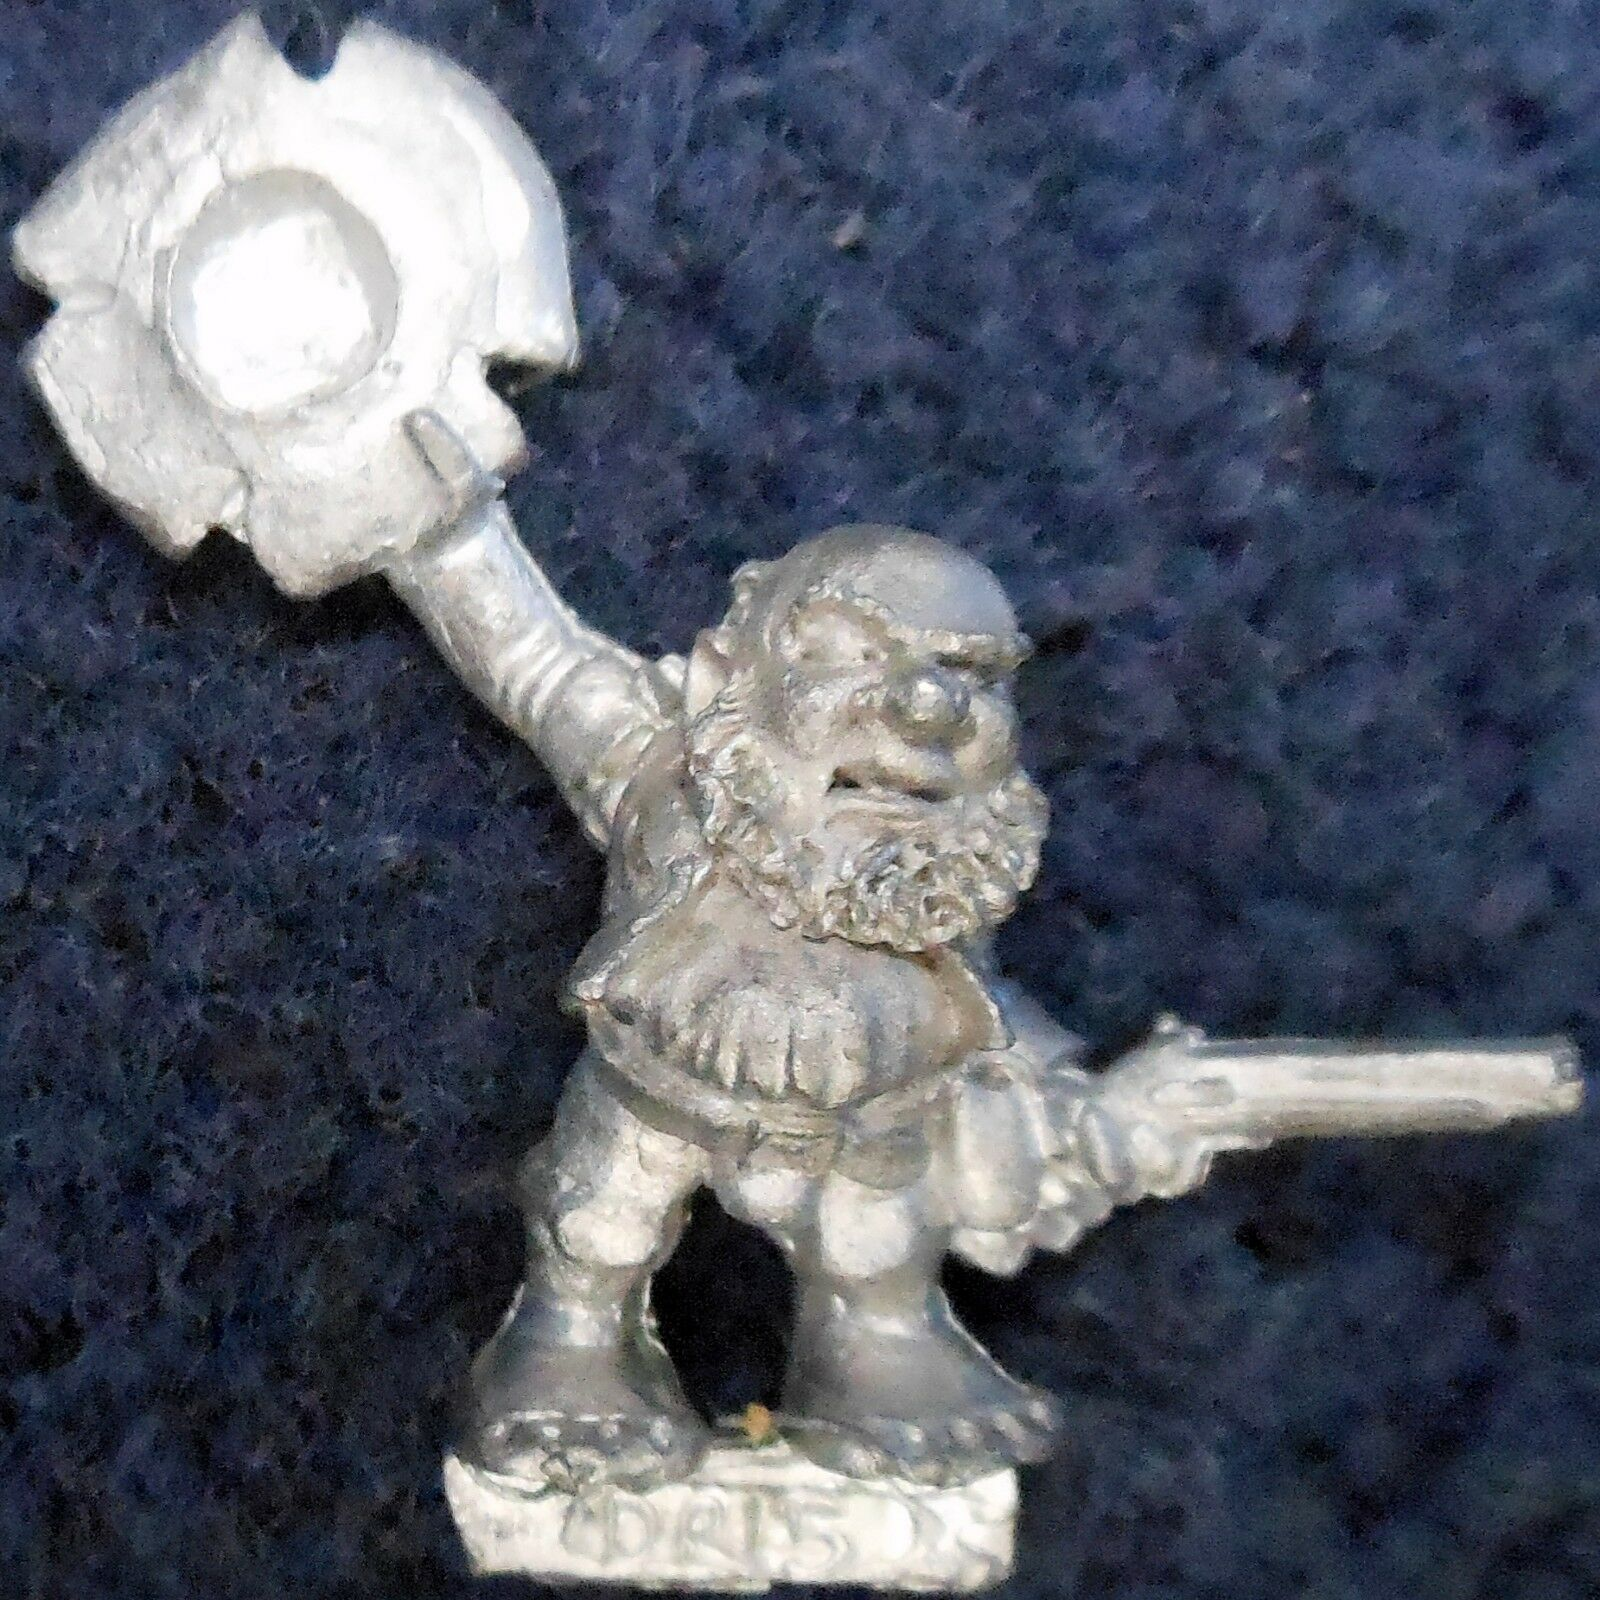 1989 Marauder MM15 DR15 Dwarf with Pistol Landsnecht MM15 2 Landsknecht Army GW